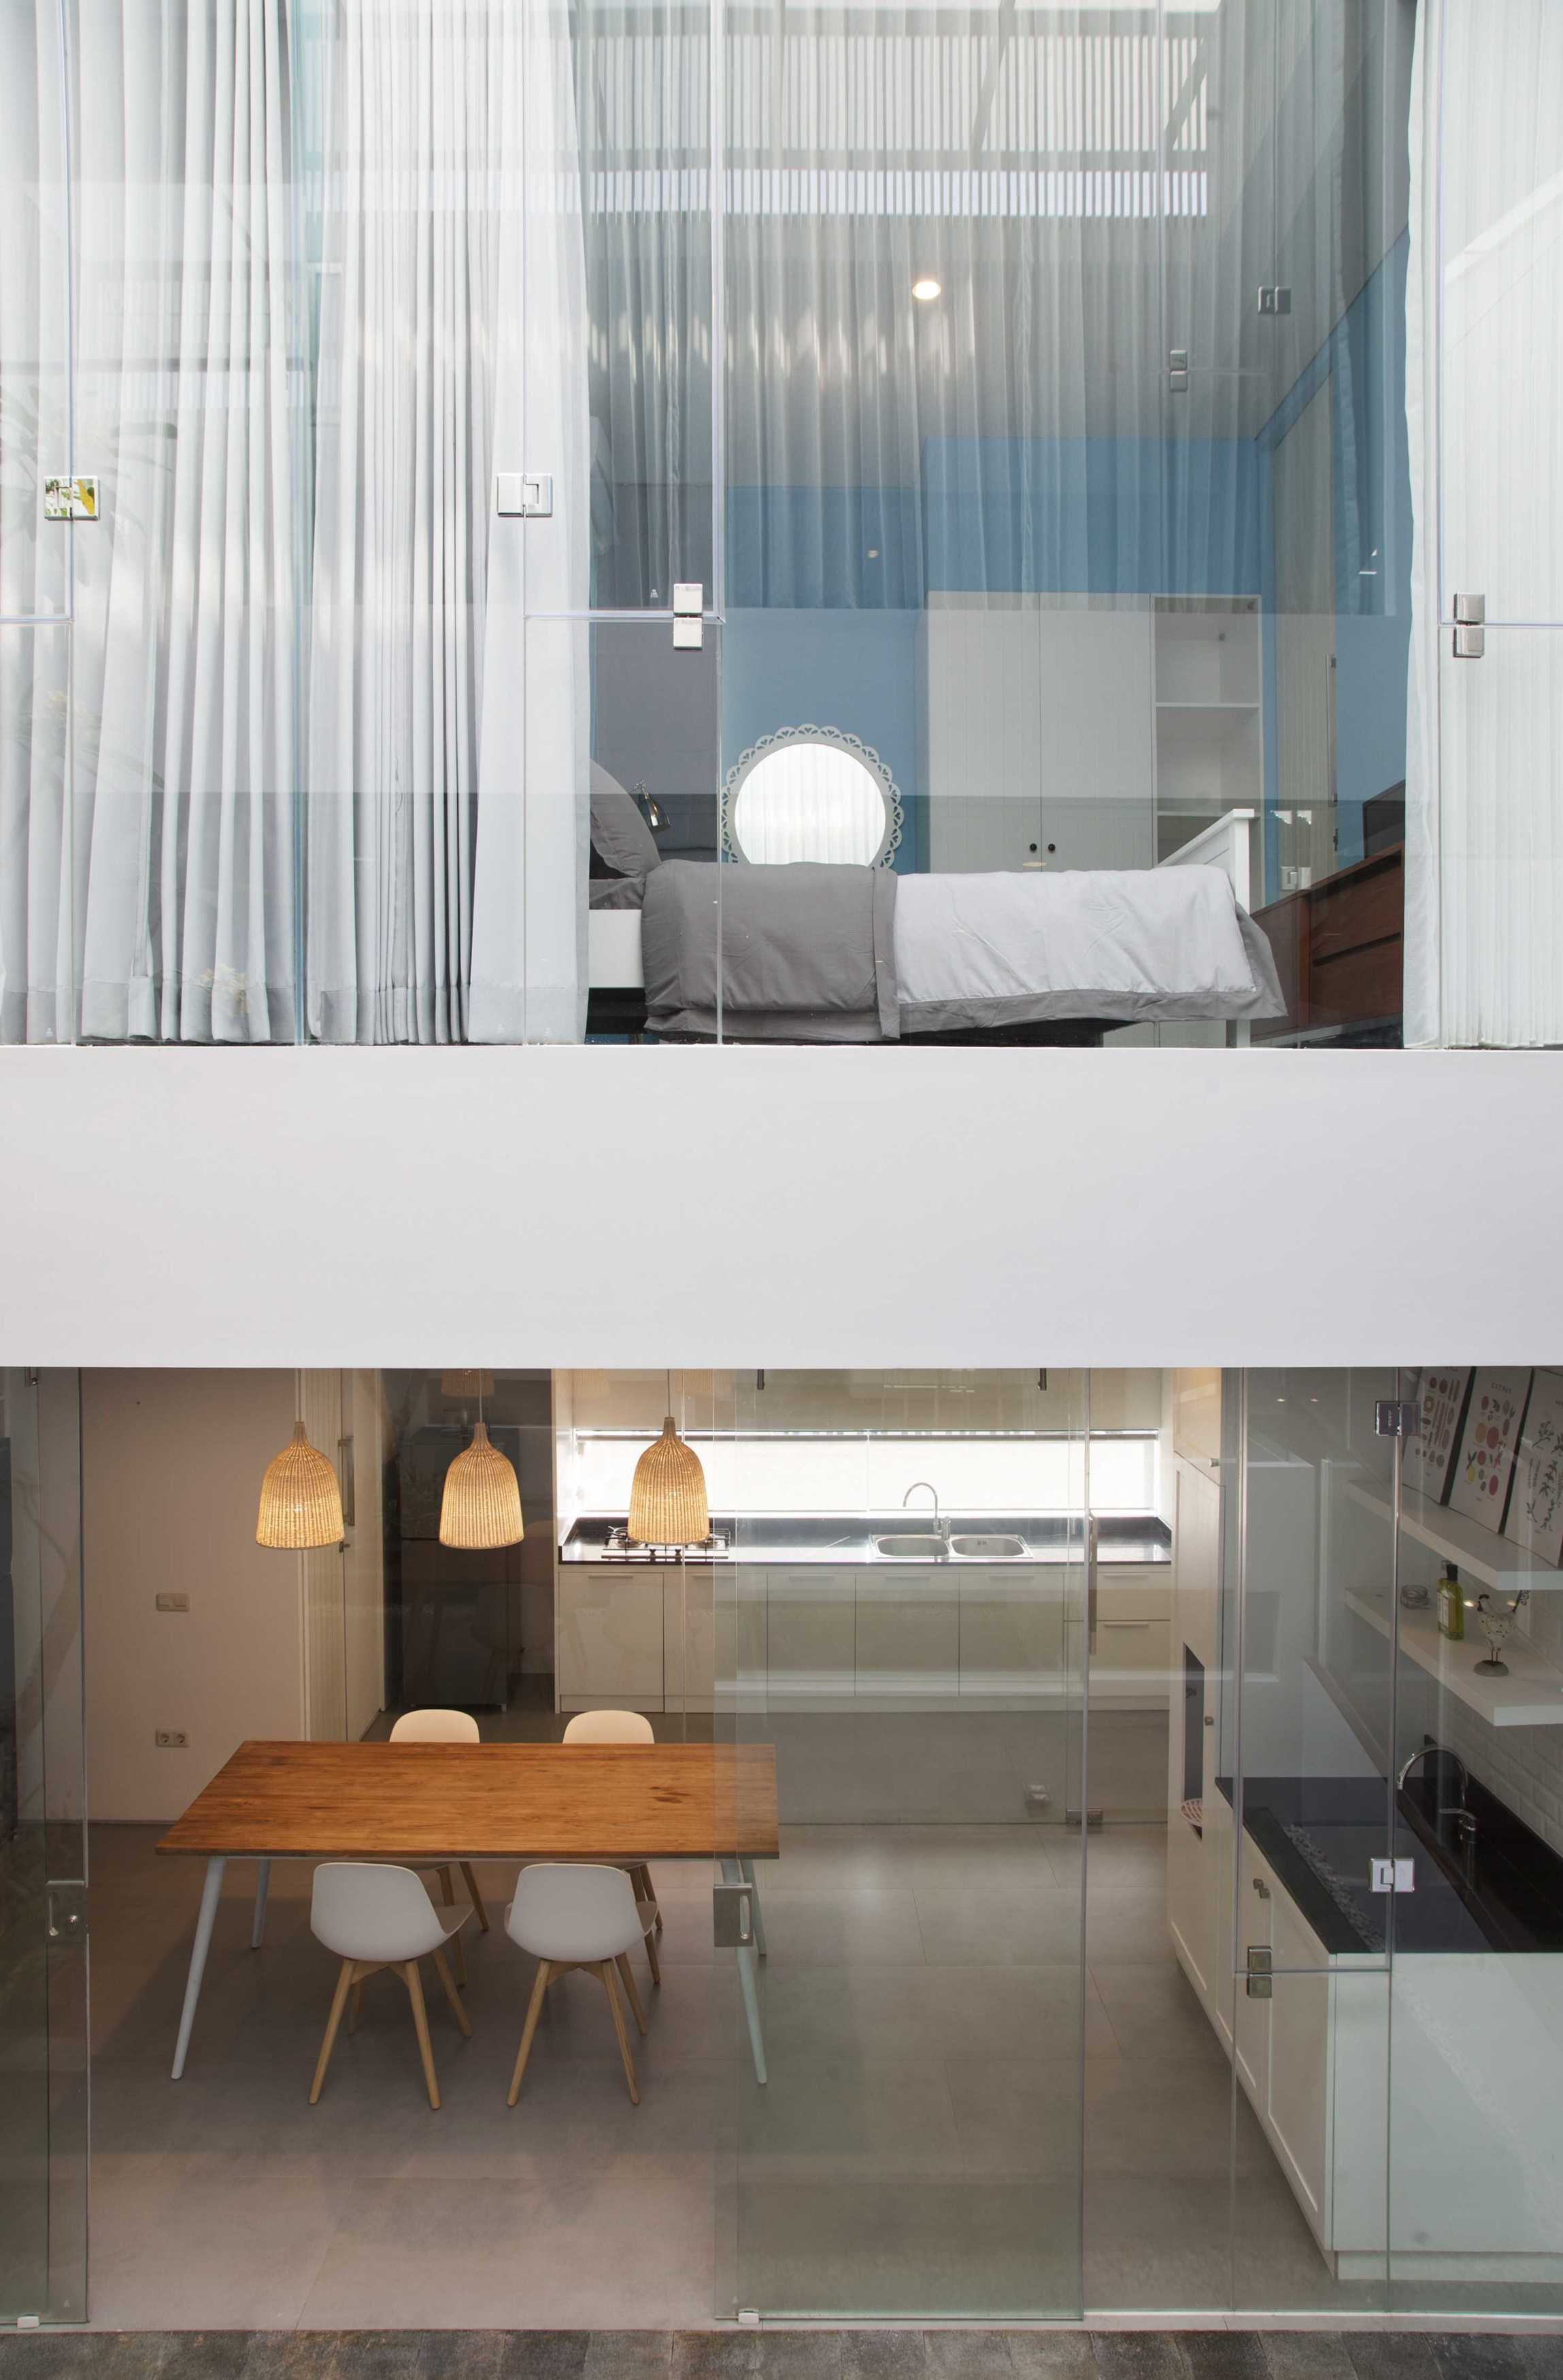 Das Quadrat Sutorejo House Surabaya, East Java, Indonesia Surabaya, East Java, Indonesia 1St And 2Nd Floor View Modern  9383